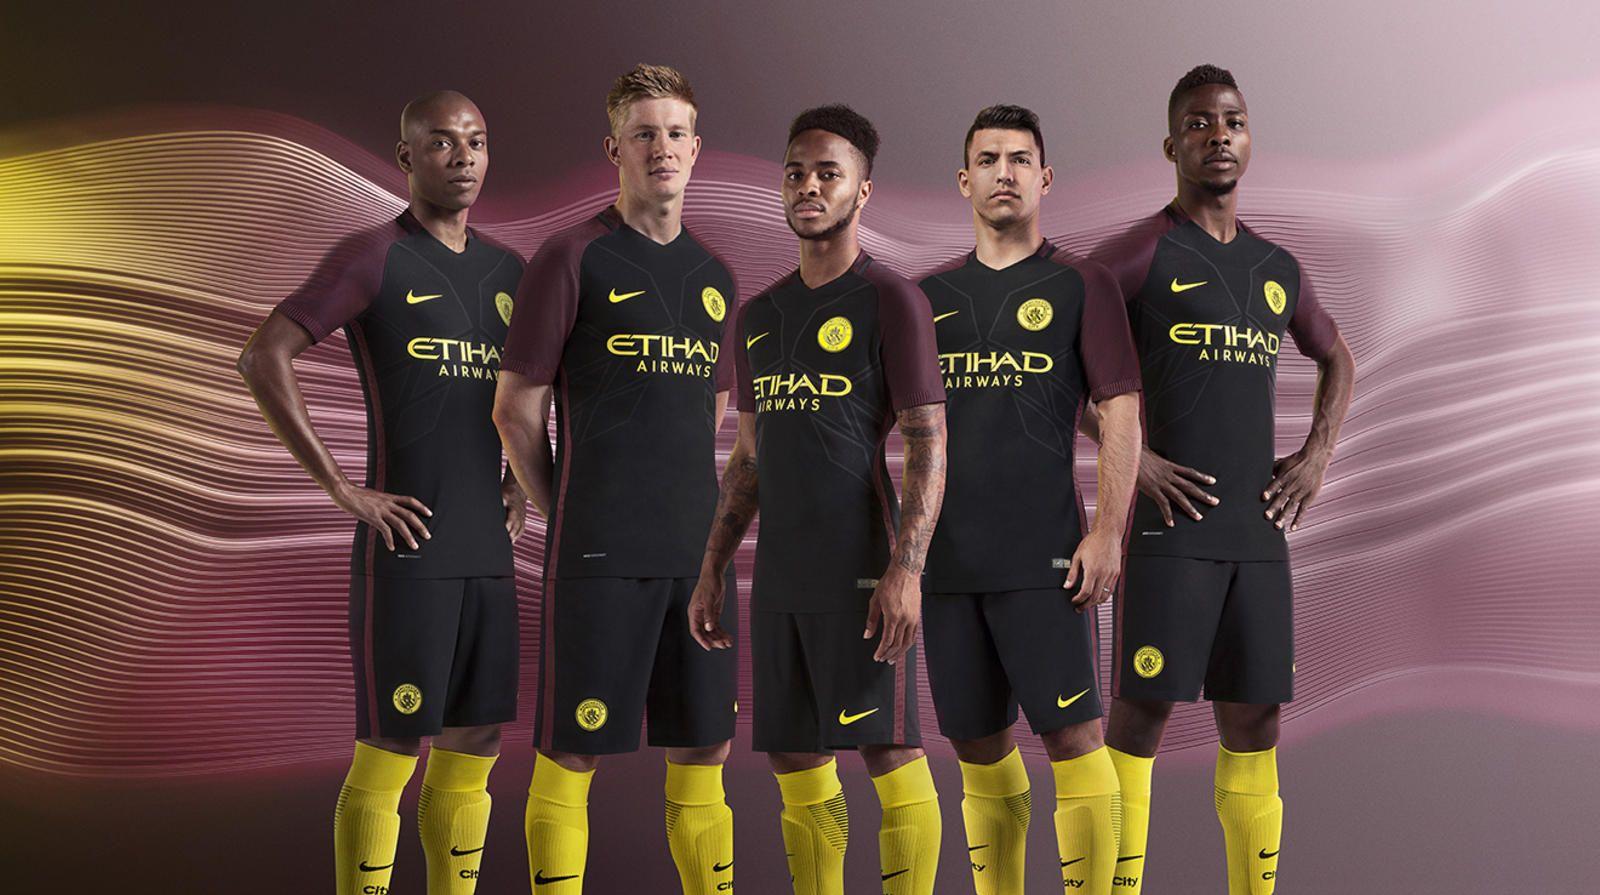 Manchester City Away Kit 2016 17 Manchester City Manchester City Football Club Arsenal Premier League